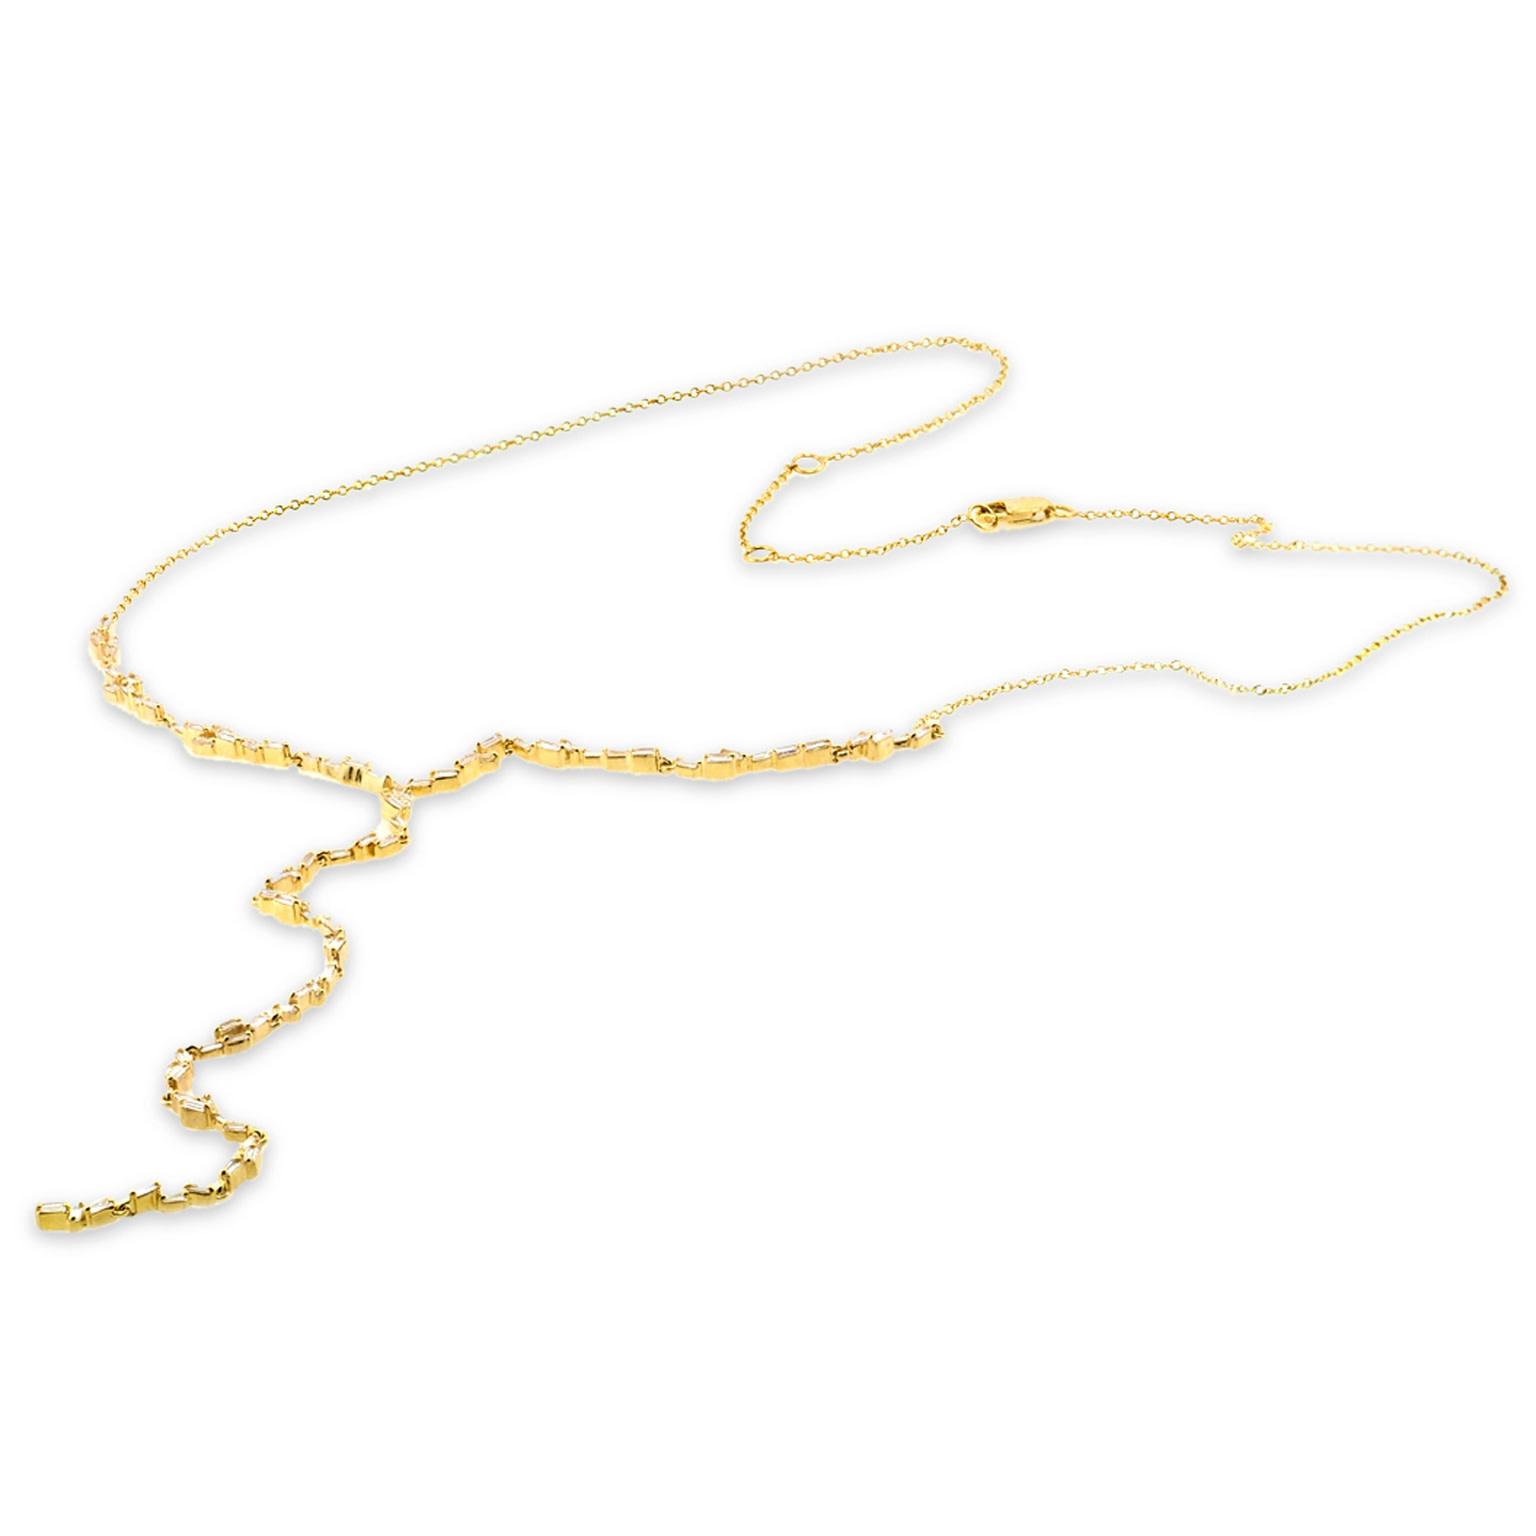 Trabert Goldsmiths Fancy Baguette Lariat Yellow Gold Necklace